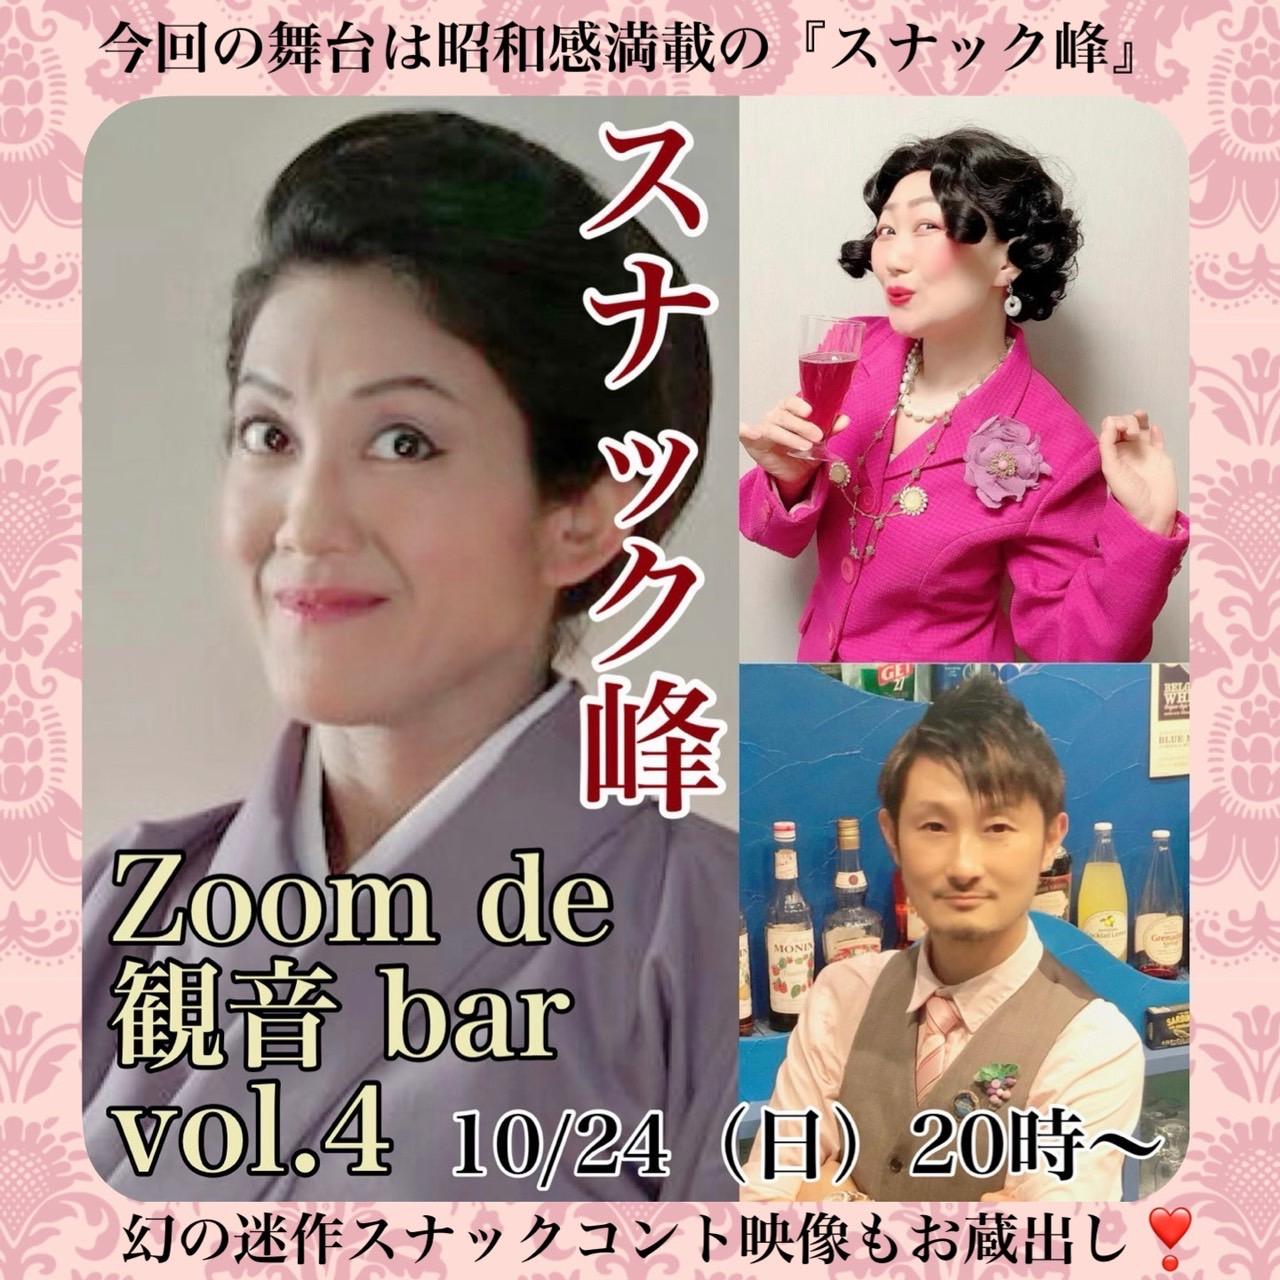 Zoom de 観音バー vol.4